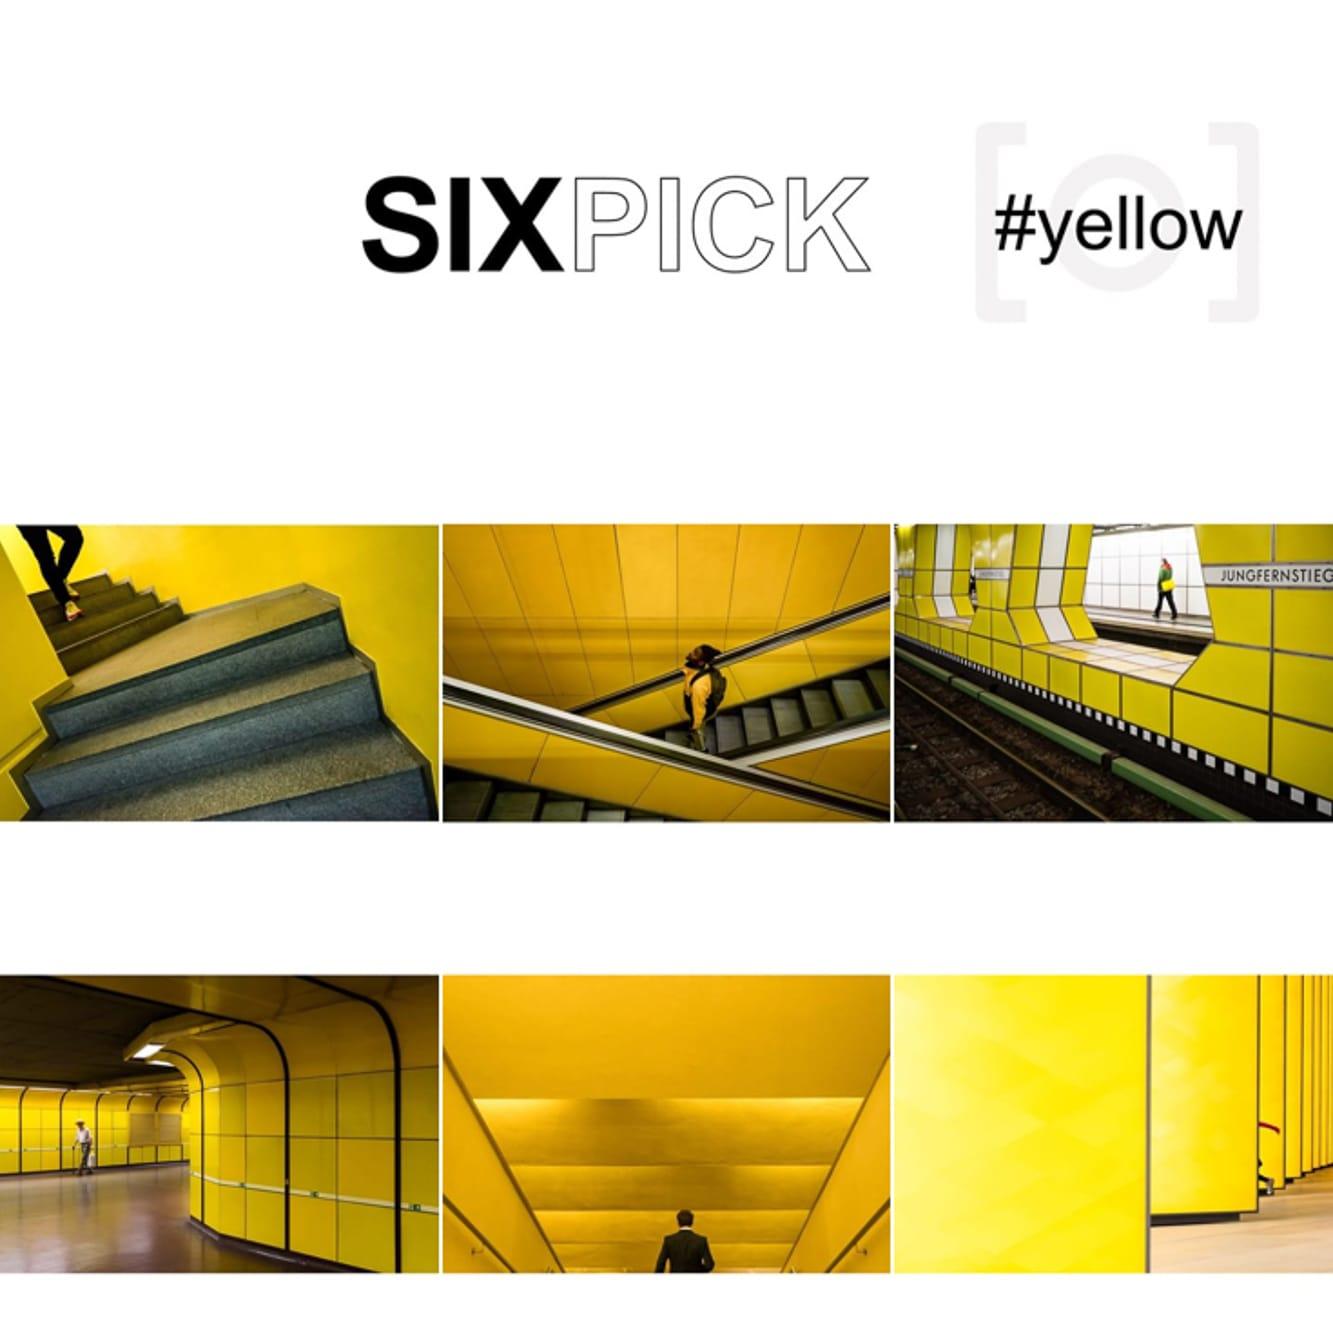 querformat-fotografie - Achim Katzberg - querformat-fotografie_sixpick_yellow-002